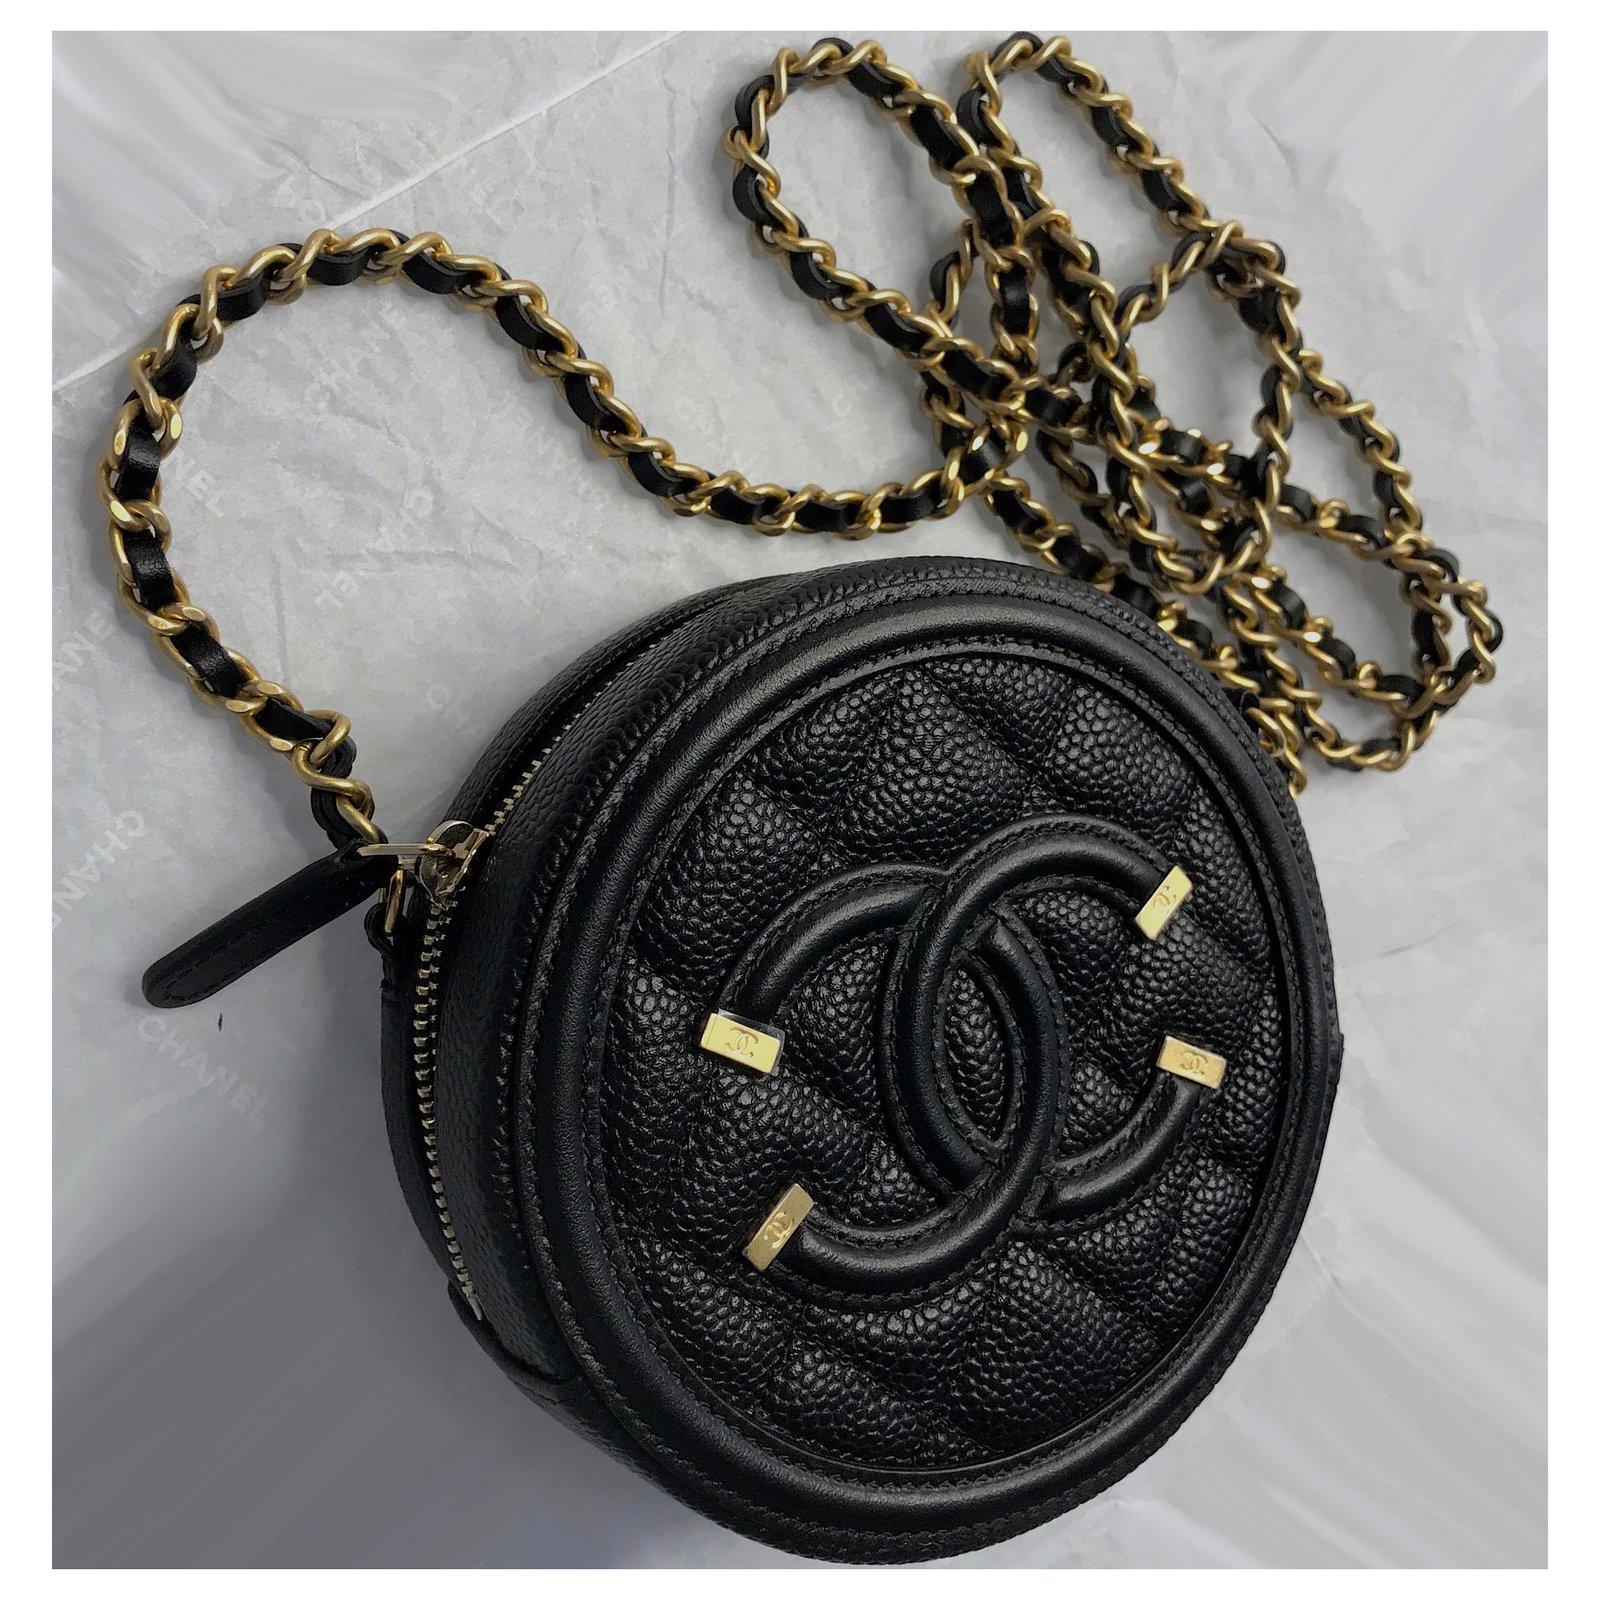 7a87c83efde08 Chanel New CC Filigree Grained Round Chain Crossbody Bag Handbags Leather  Black ref.137611 - Joli Closet